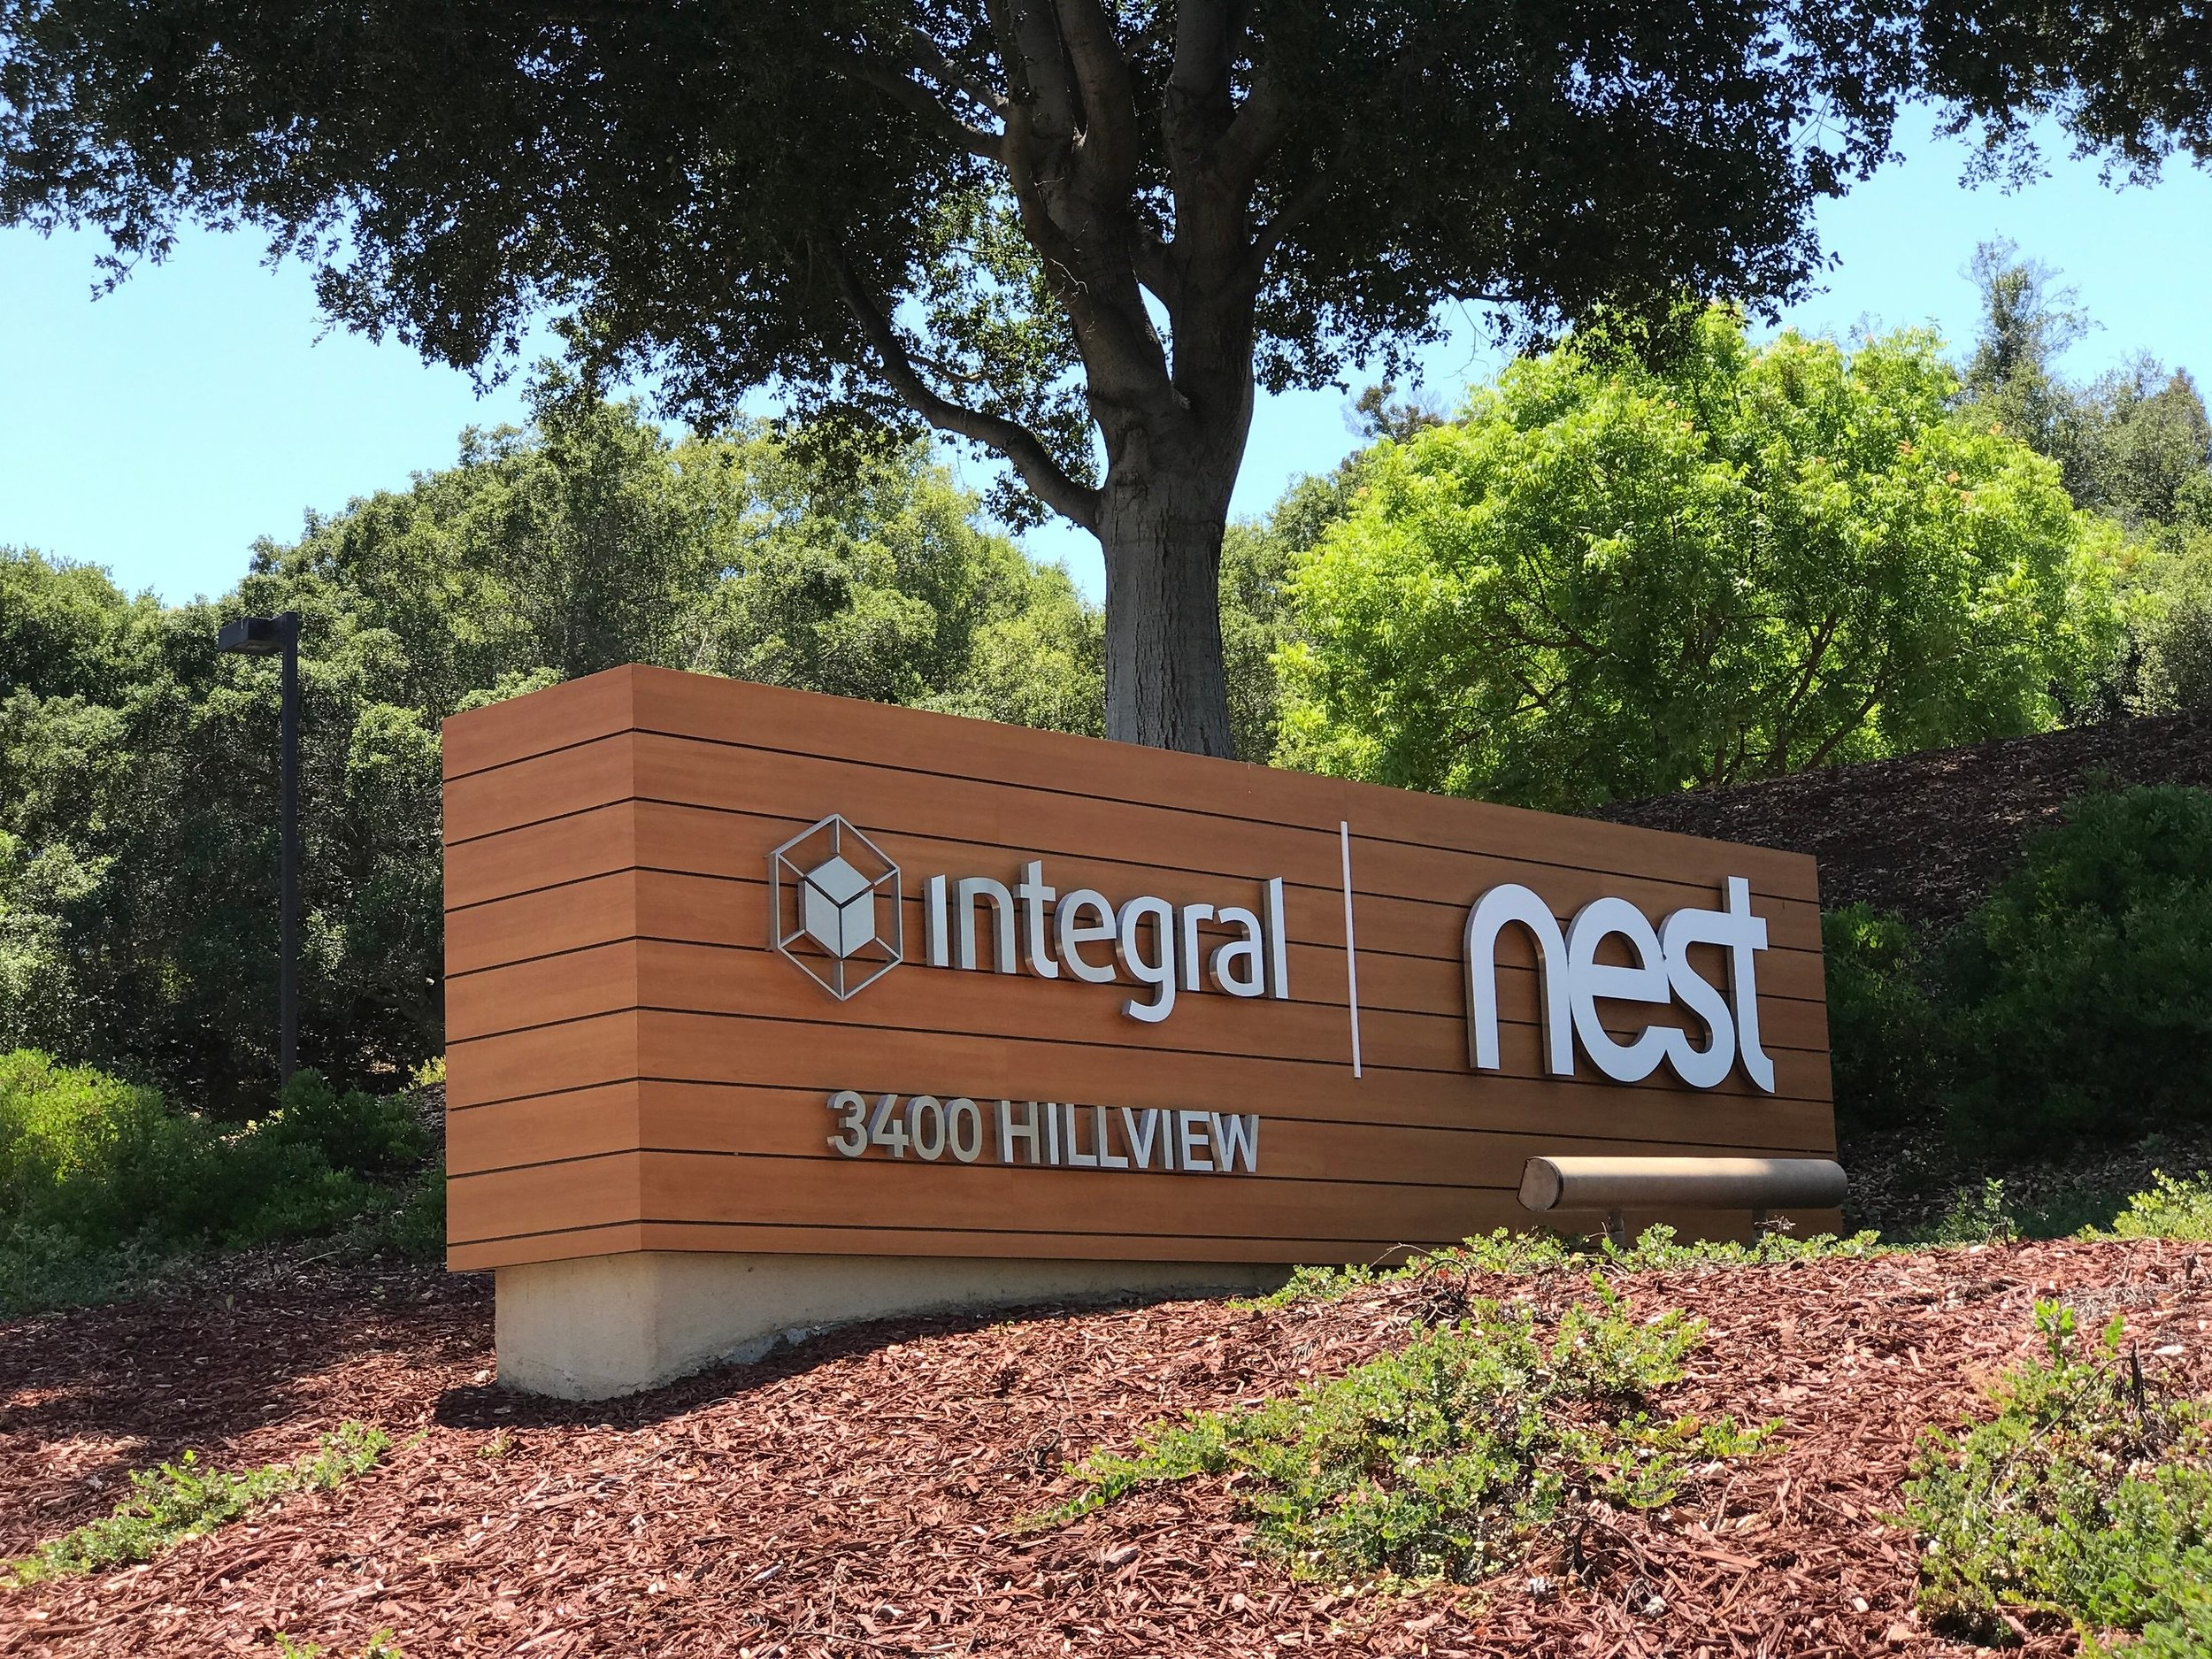 Nest Los Altos Hills Blu Skye Media Silicon Valley Photographer-X5.jpeg